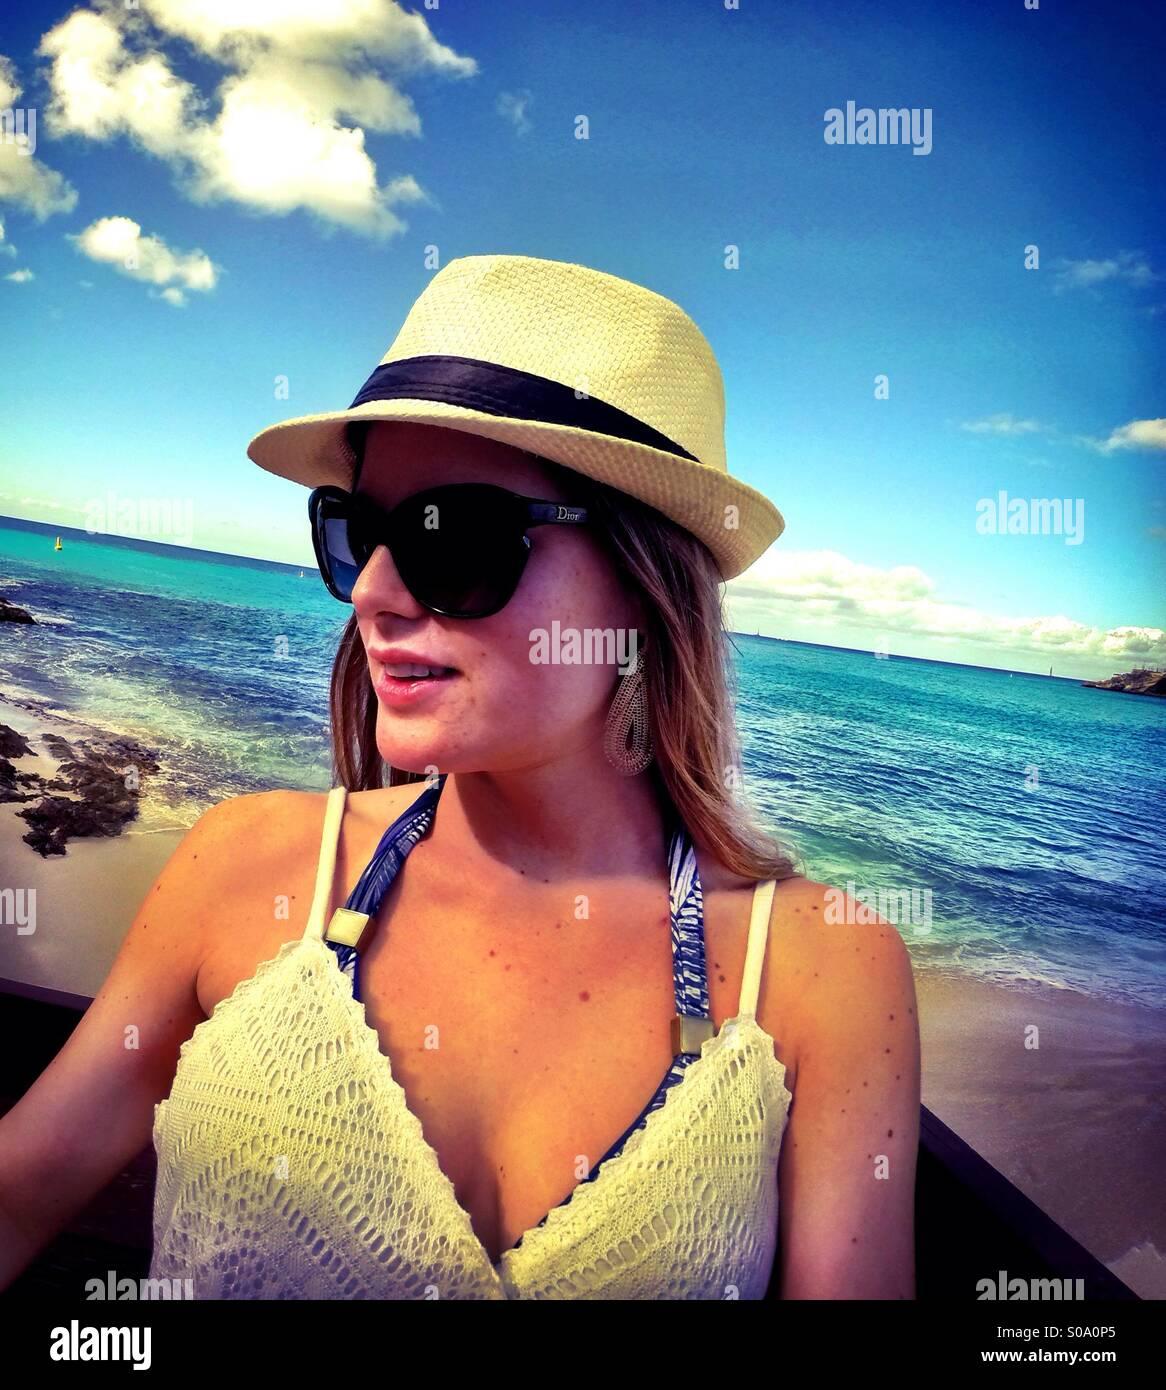 Caribbean Saint Maarten islands portrait - fashion, beach, travel, lifestyle - Stock Image